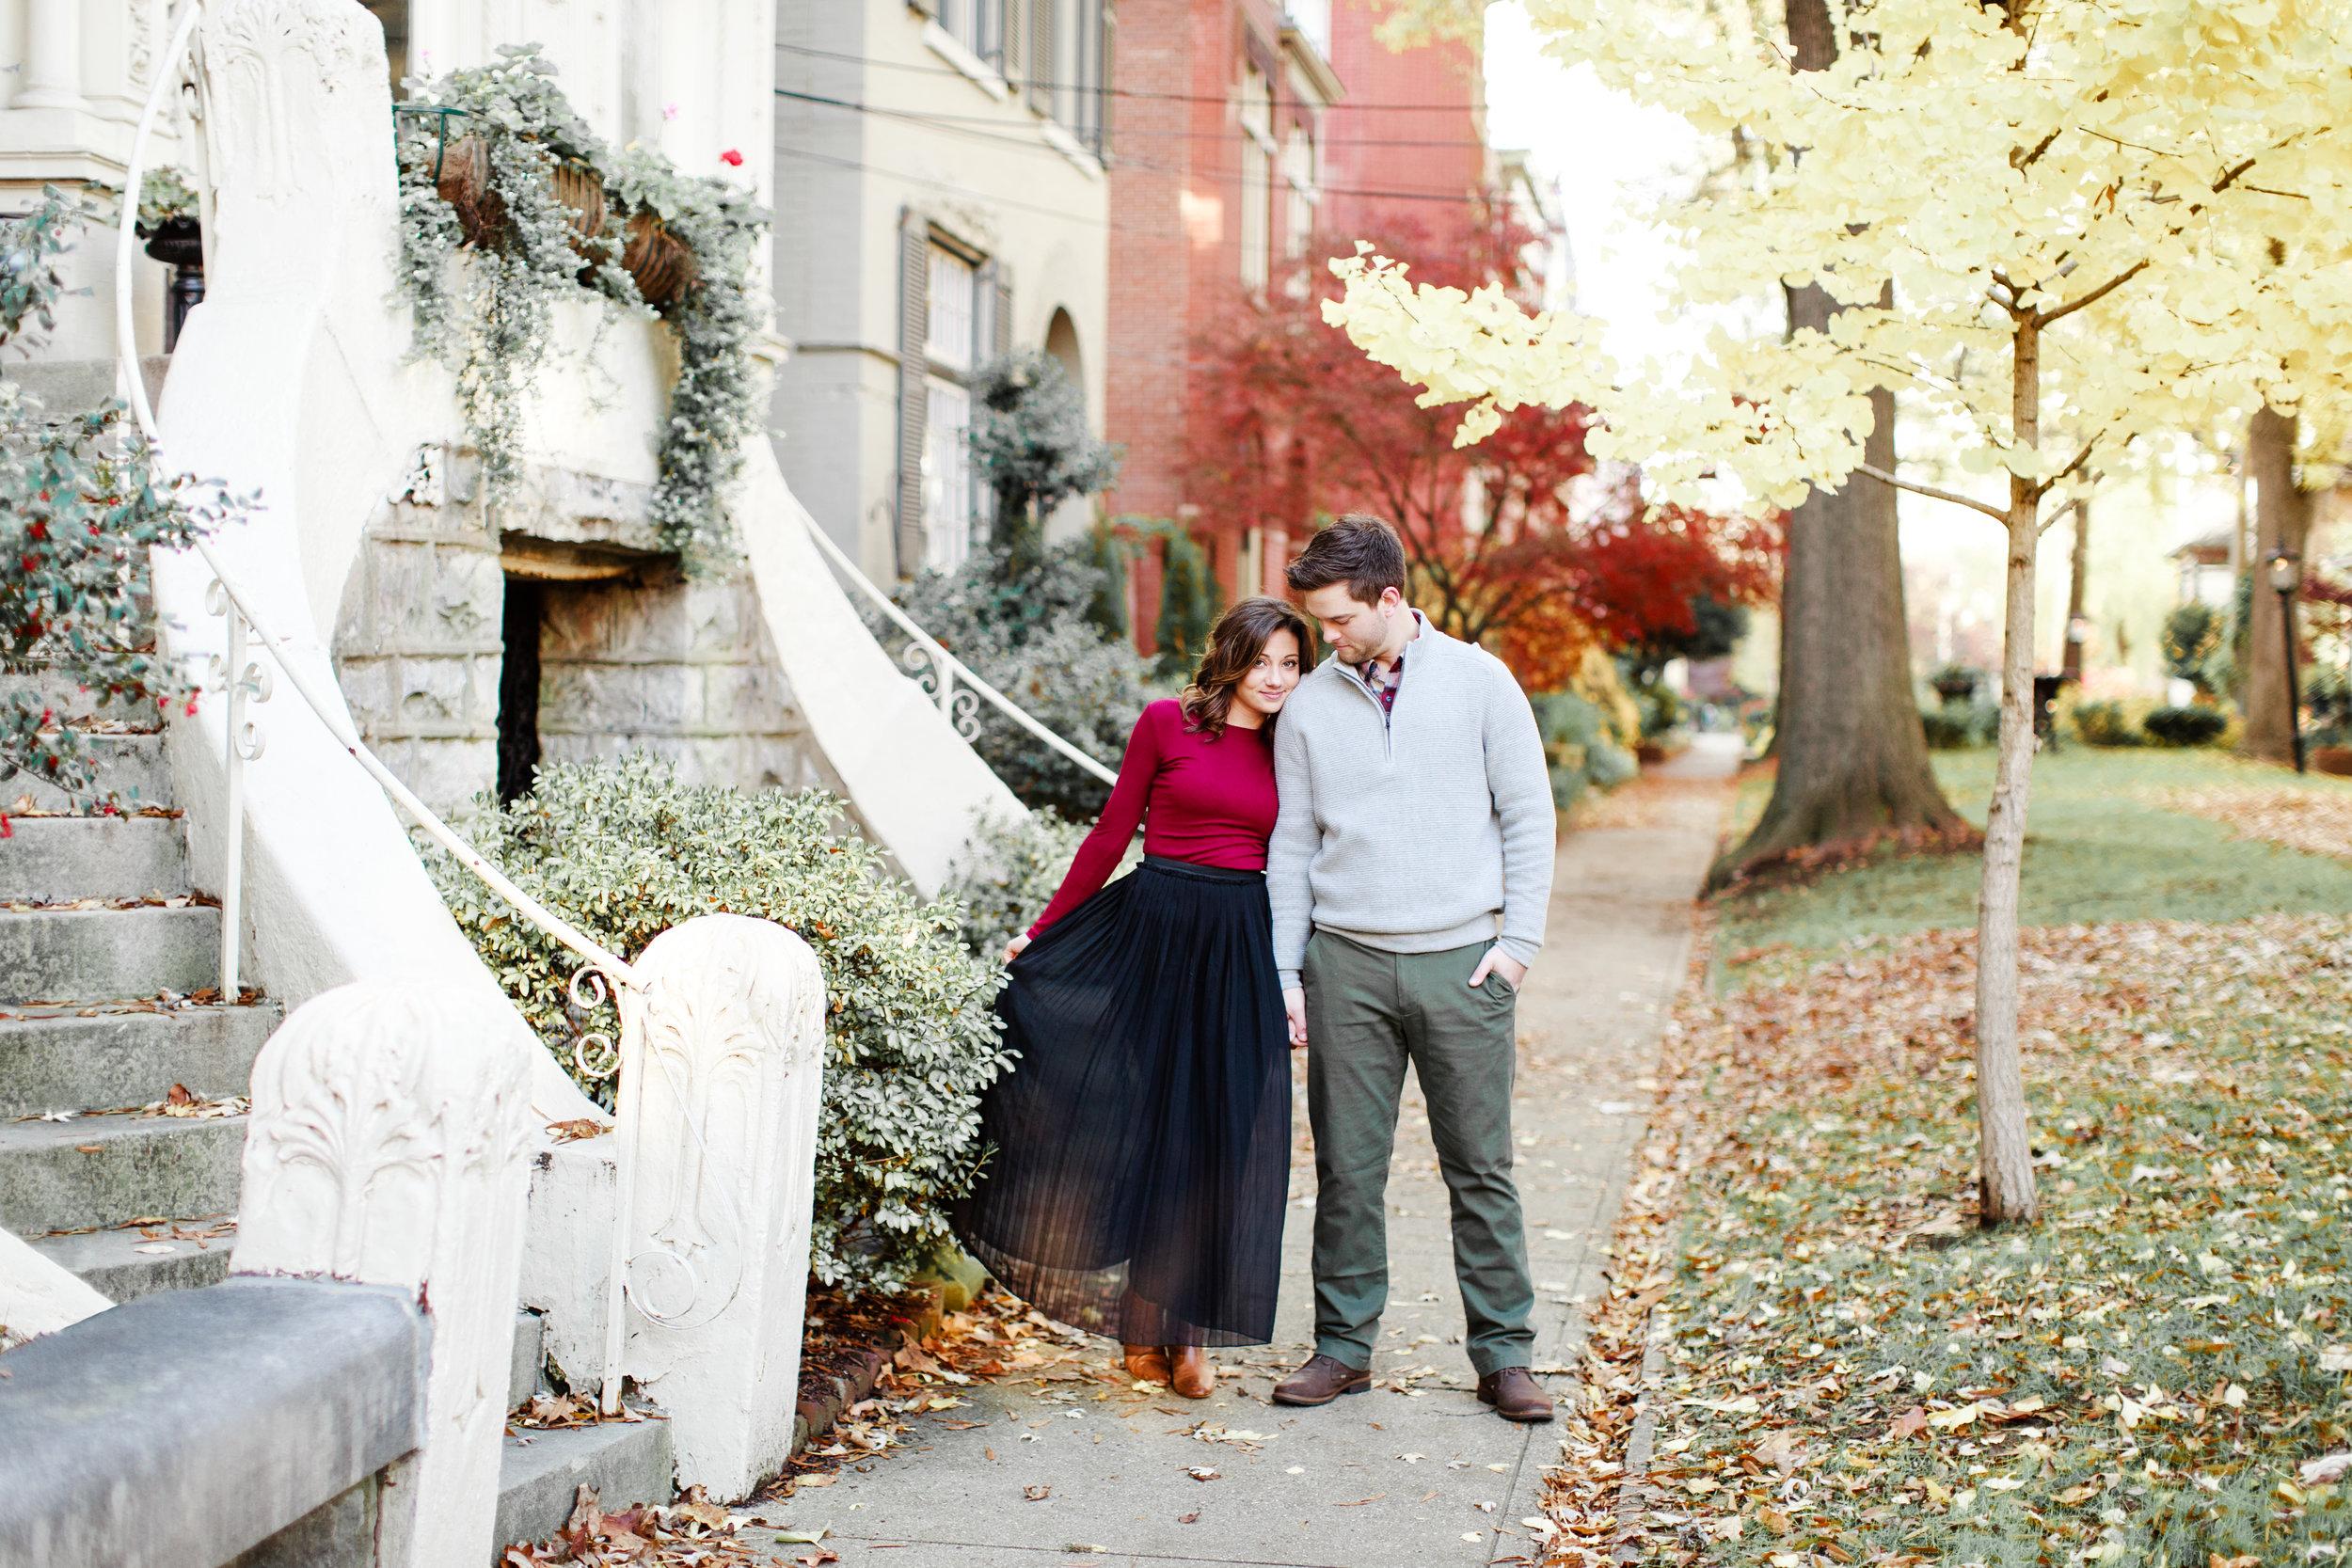 Chelsea + Zack - Downtown Engagement Portraiture at St. James Court | Louisville, Kentucky